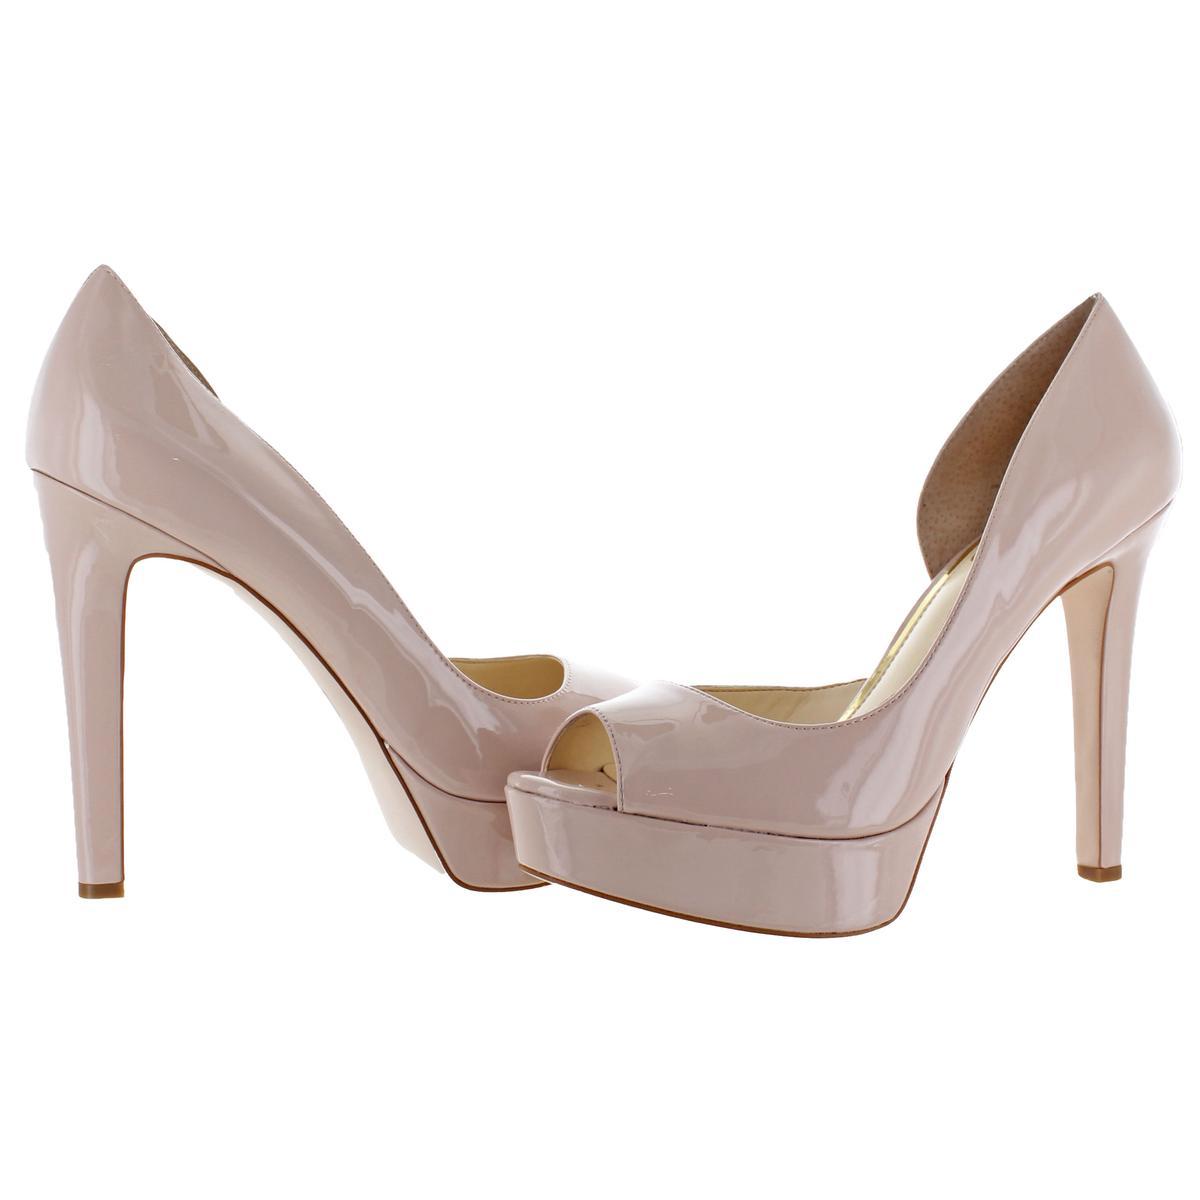 Jessica-Simpson-Martella-Women-039-s-Almond-Peep-Toe-Stiletto-d-039-Orsay-Heels-Shoes thumbnail 4